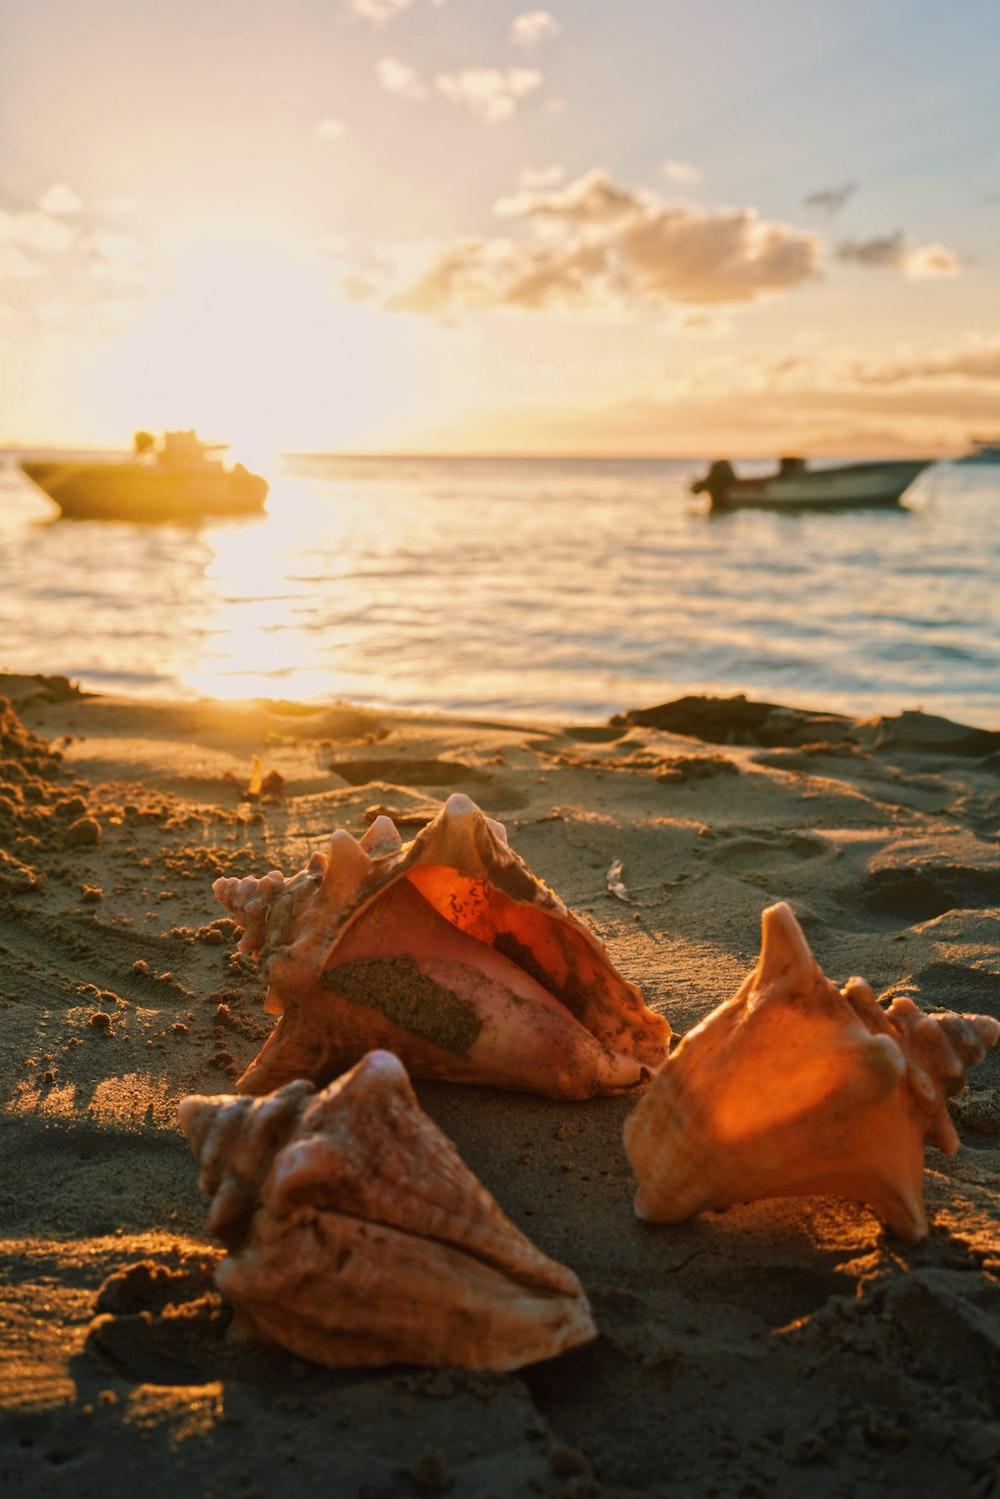 three pink shells on seashore during sunset